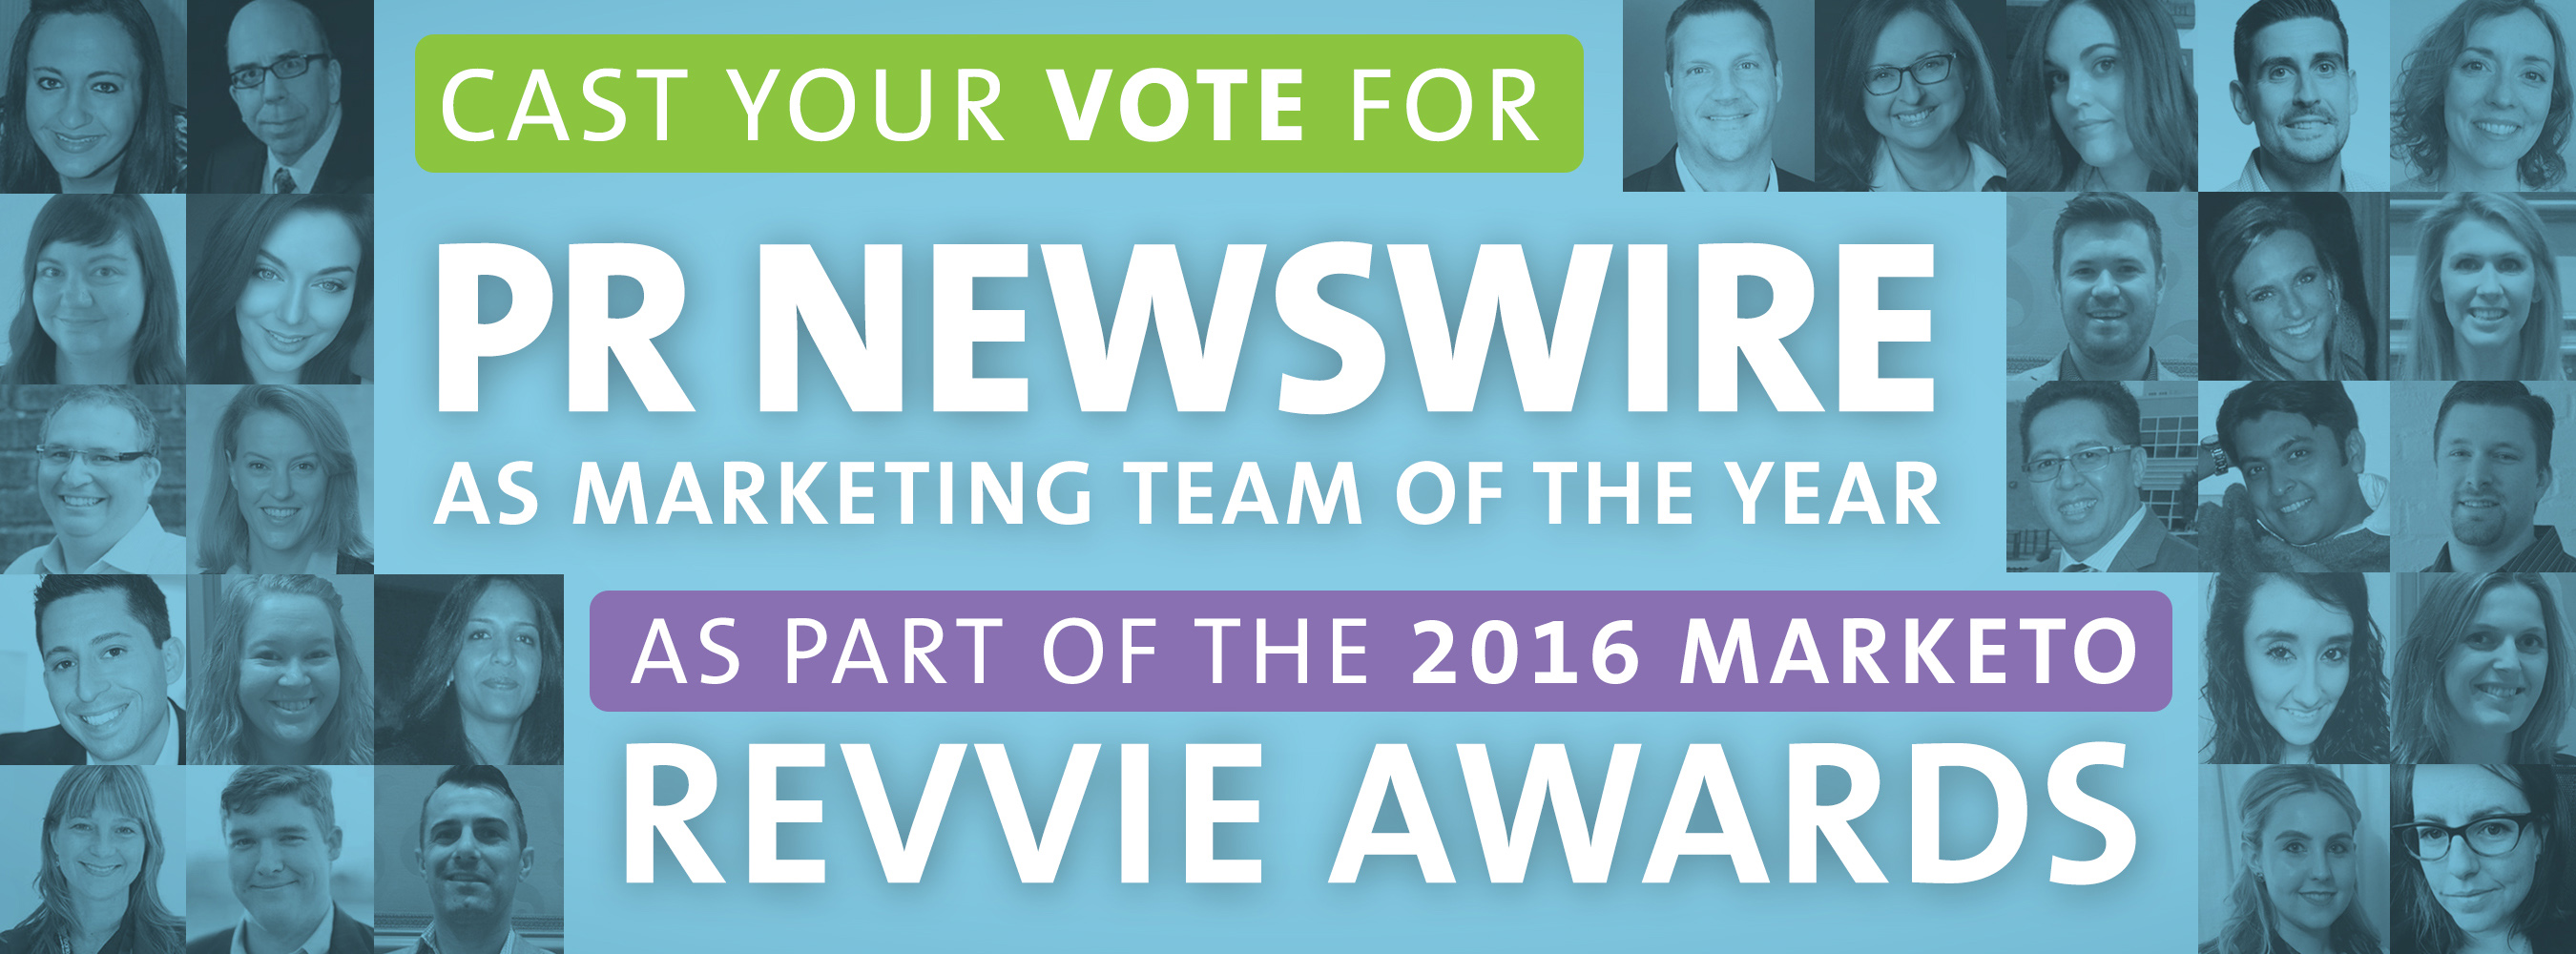 Vote for PR Newswire to win 2016 Marketo Revvie for Marketing Team of the Year, Enterprise.